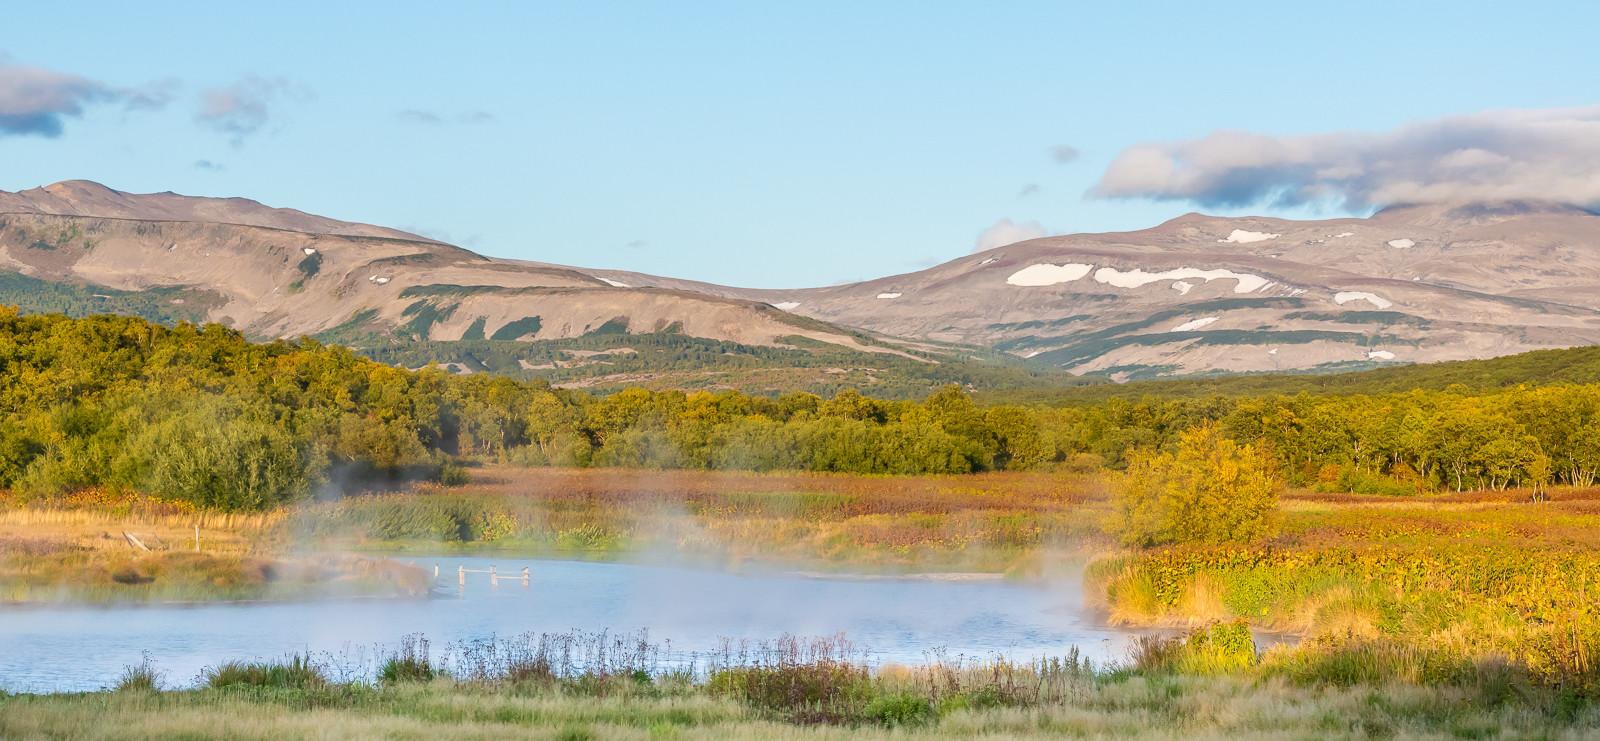 1809Kamchatka-landschap-4.jpg